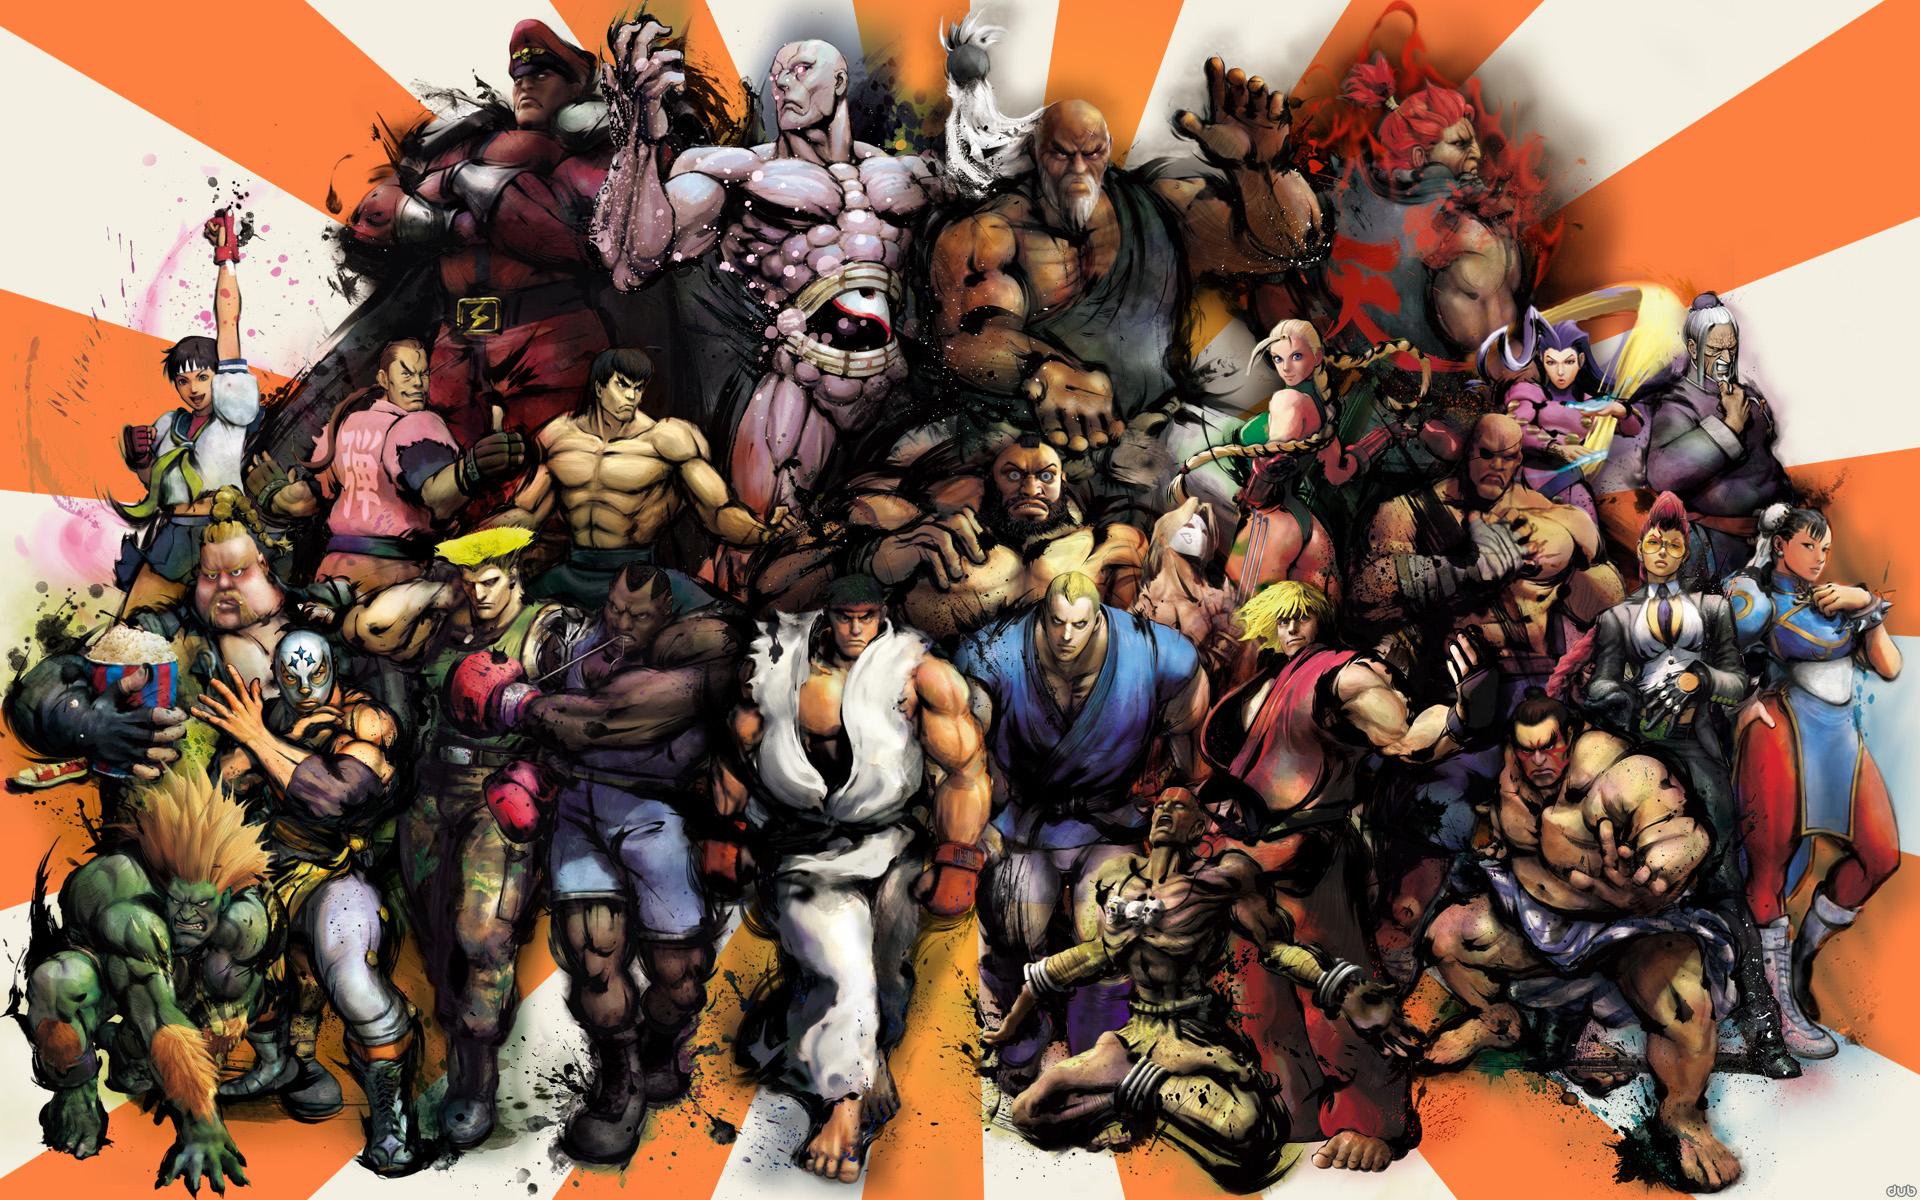 Super Street Fighter IV Wallpaper High Quality